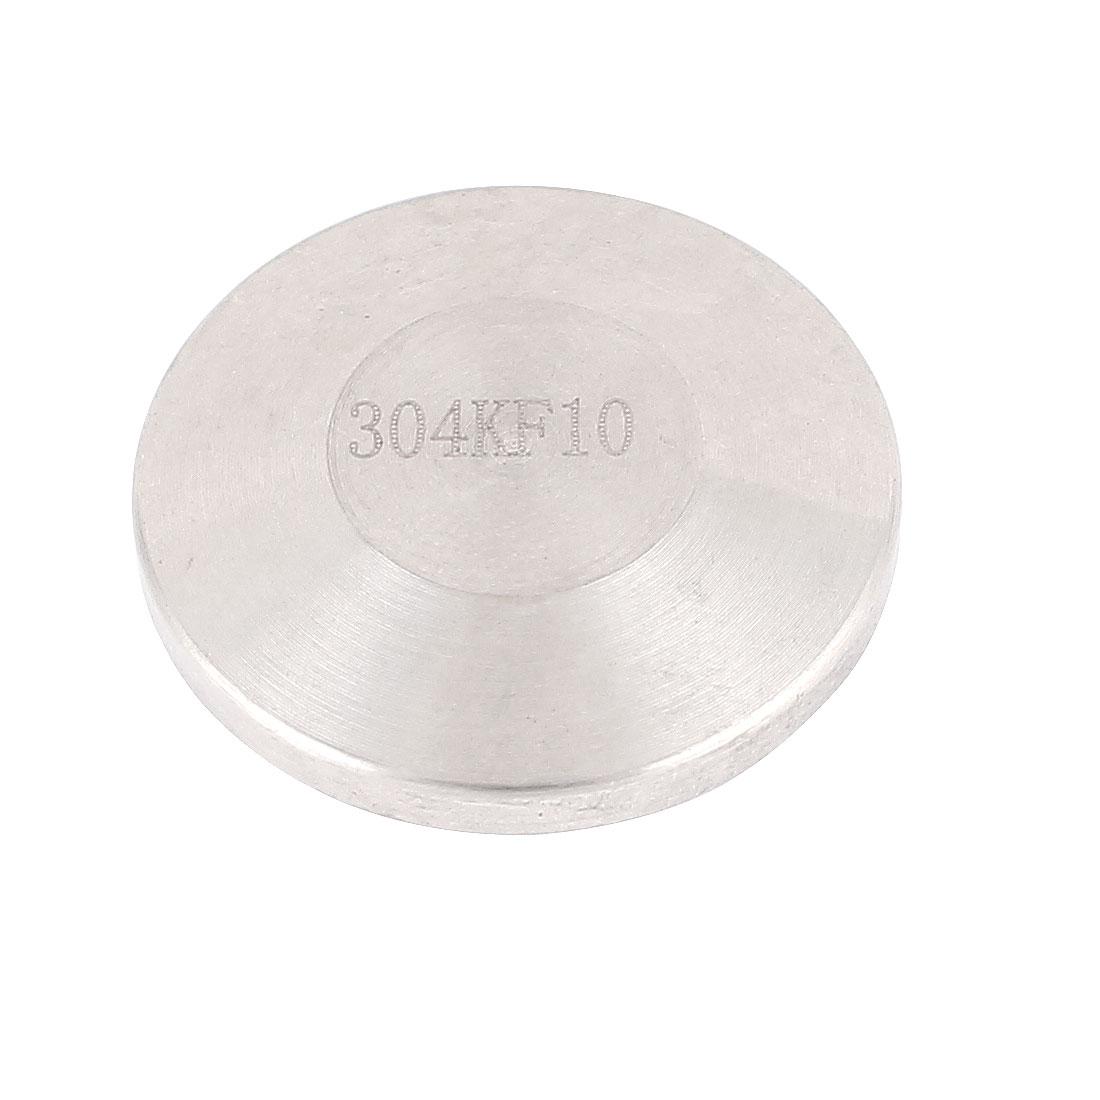 Stainless Steel 304 KF10 KF-10 Blank Flange Vacuum Fitting